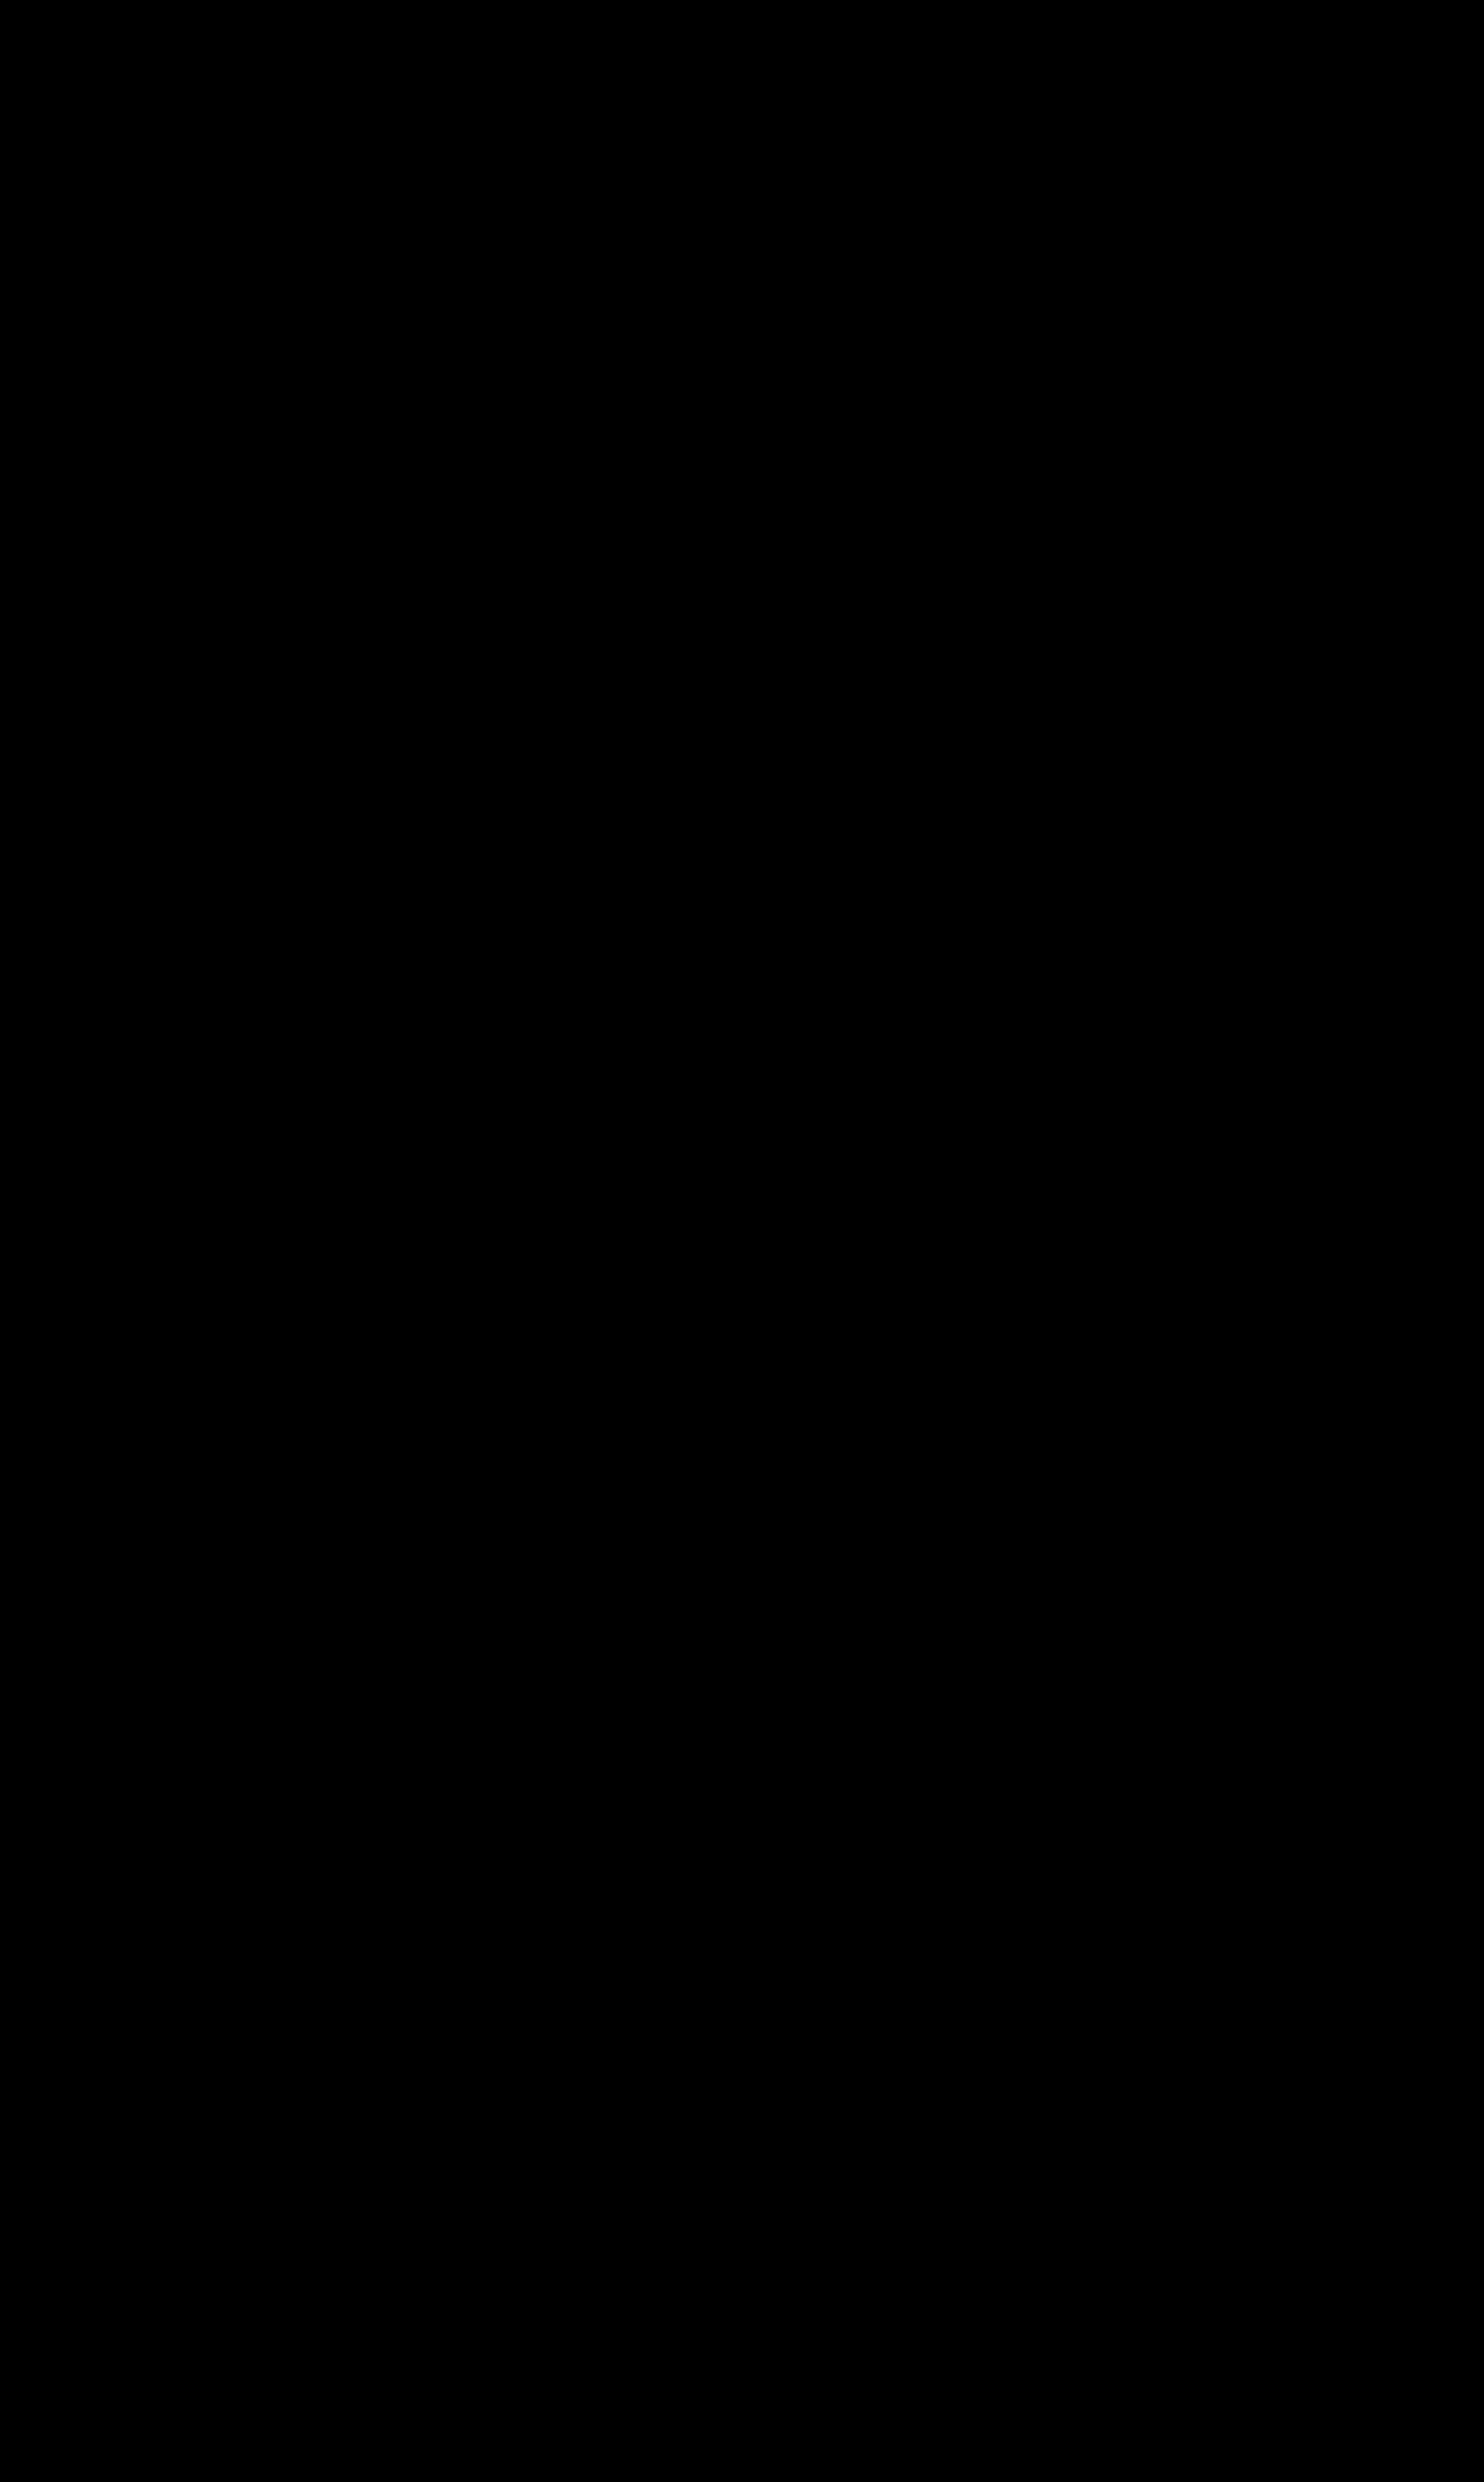 2 ETOILES AU GUIDE HACHETTE